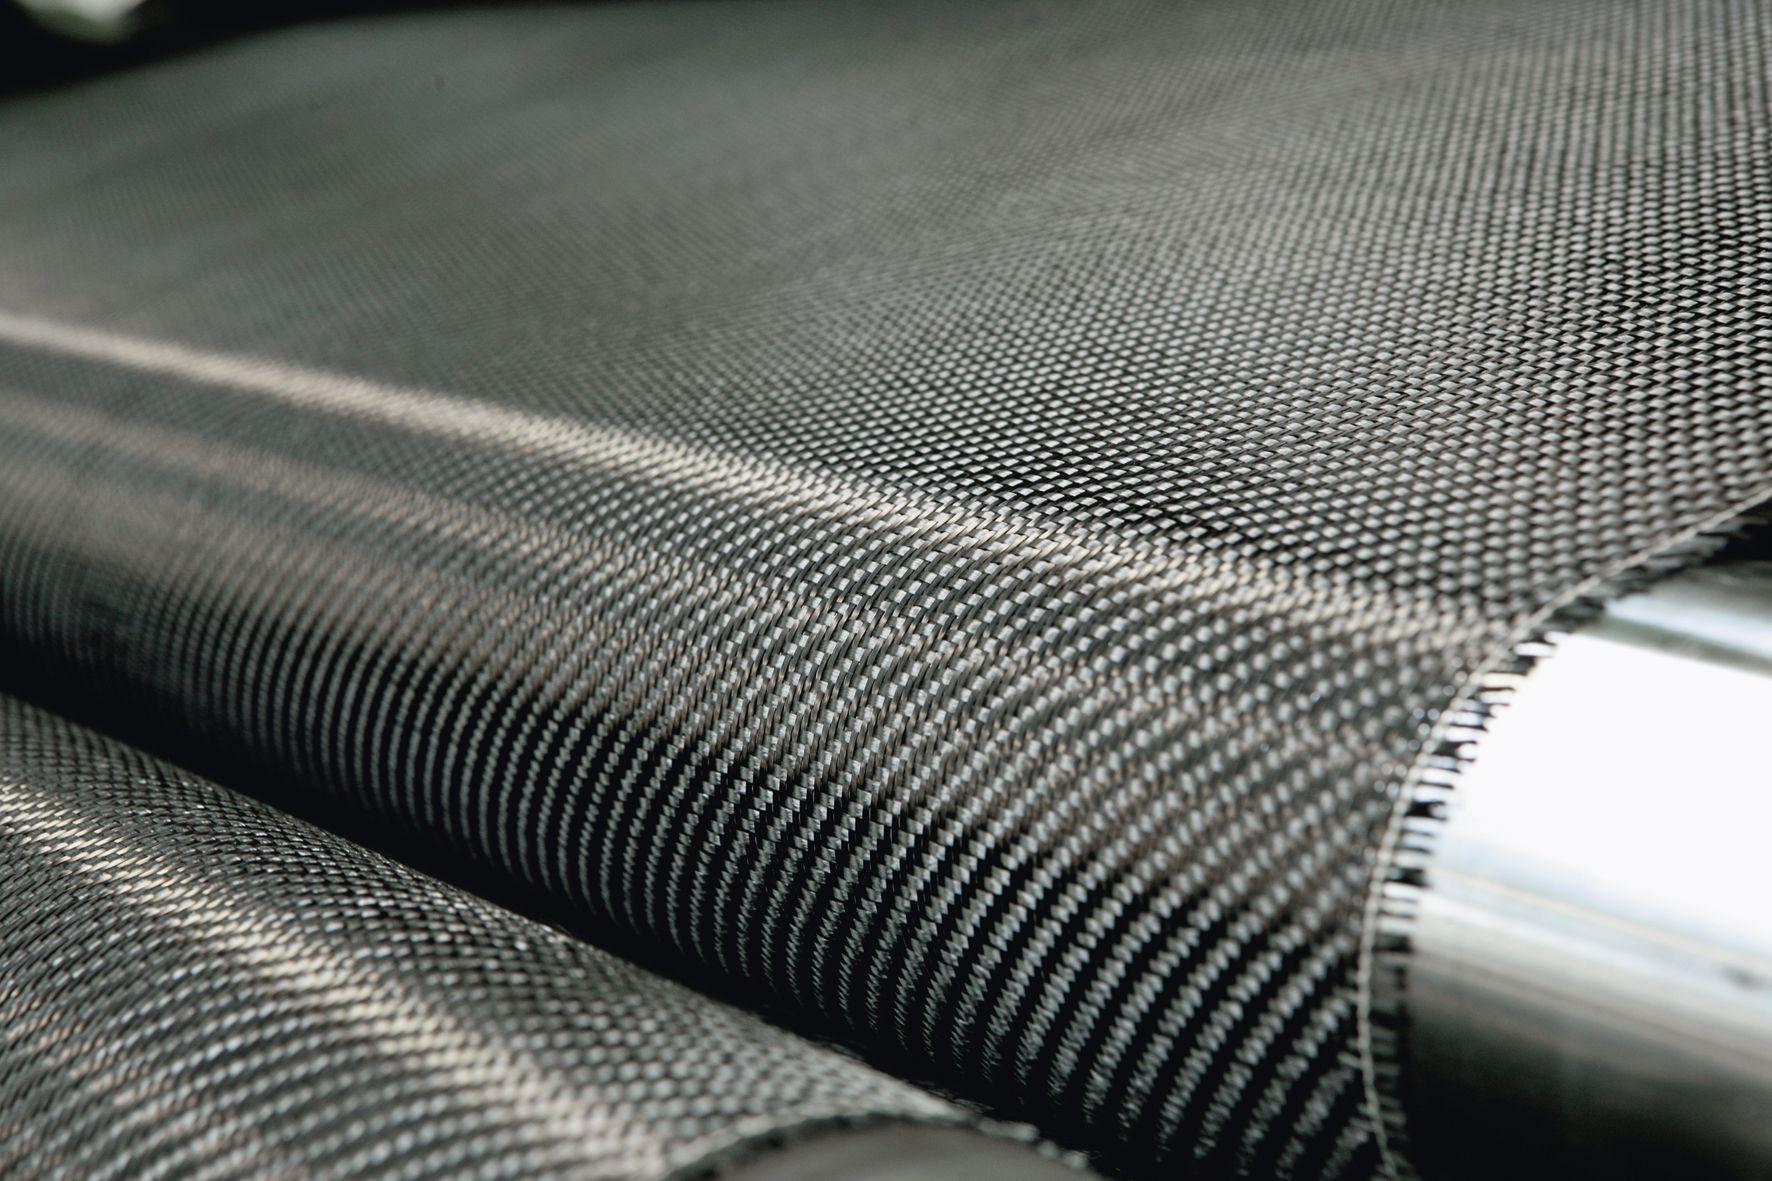 Carbon Fiber Reinforced Plastics Cfrp Market Report 2026 Carbon Fiber Carbon Fiber Composite Carbon